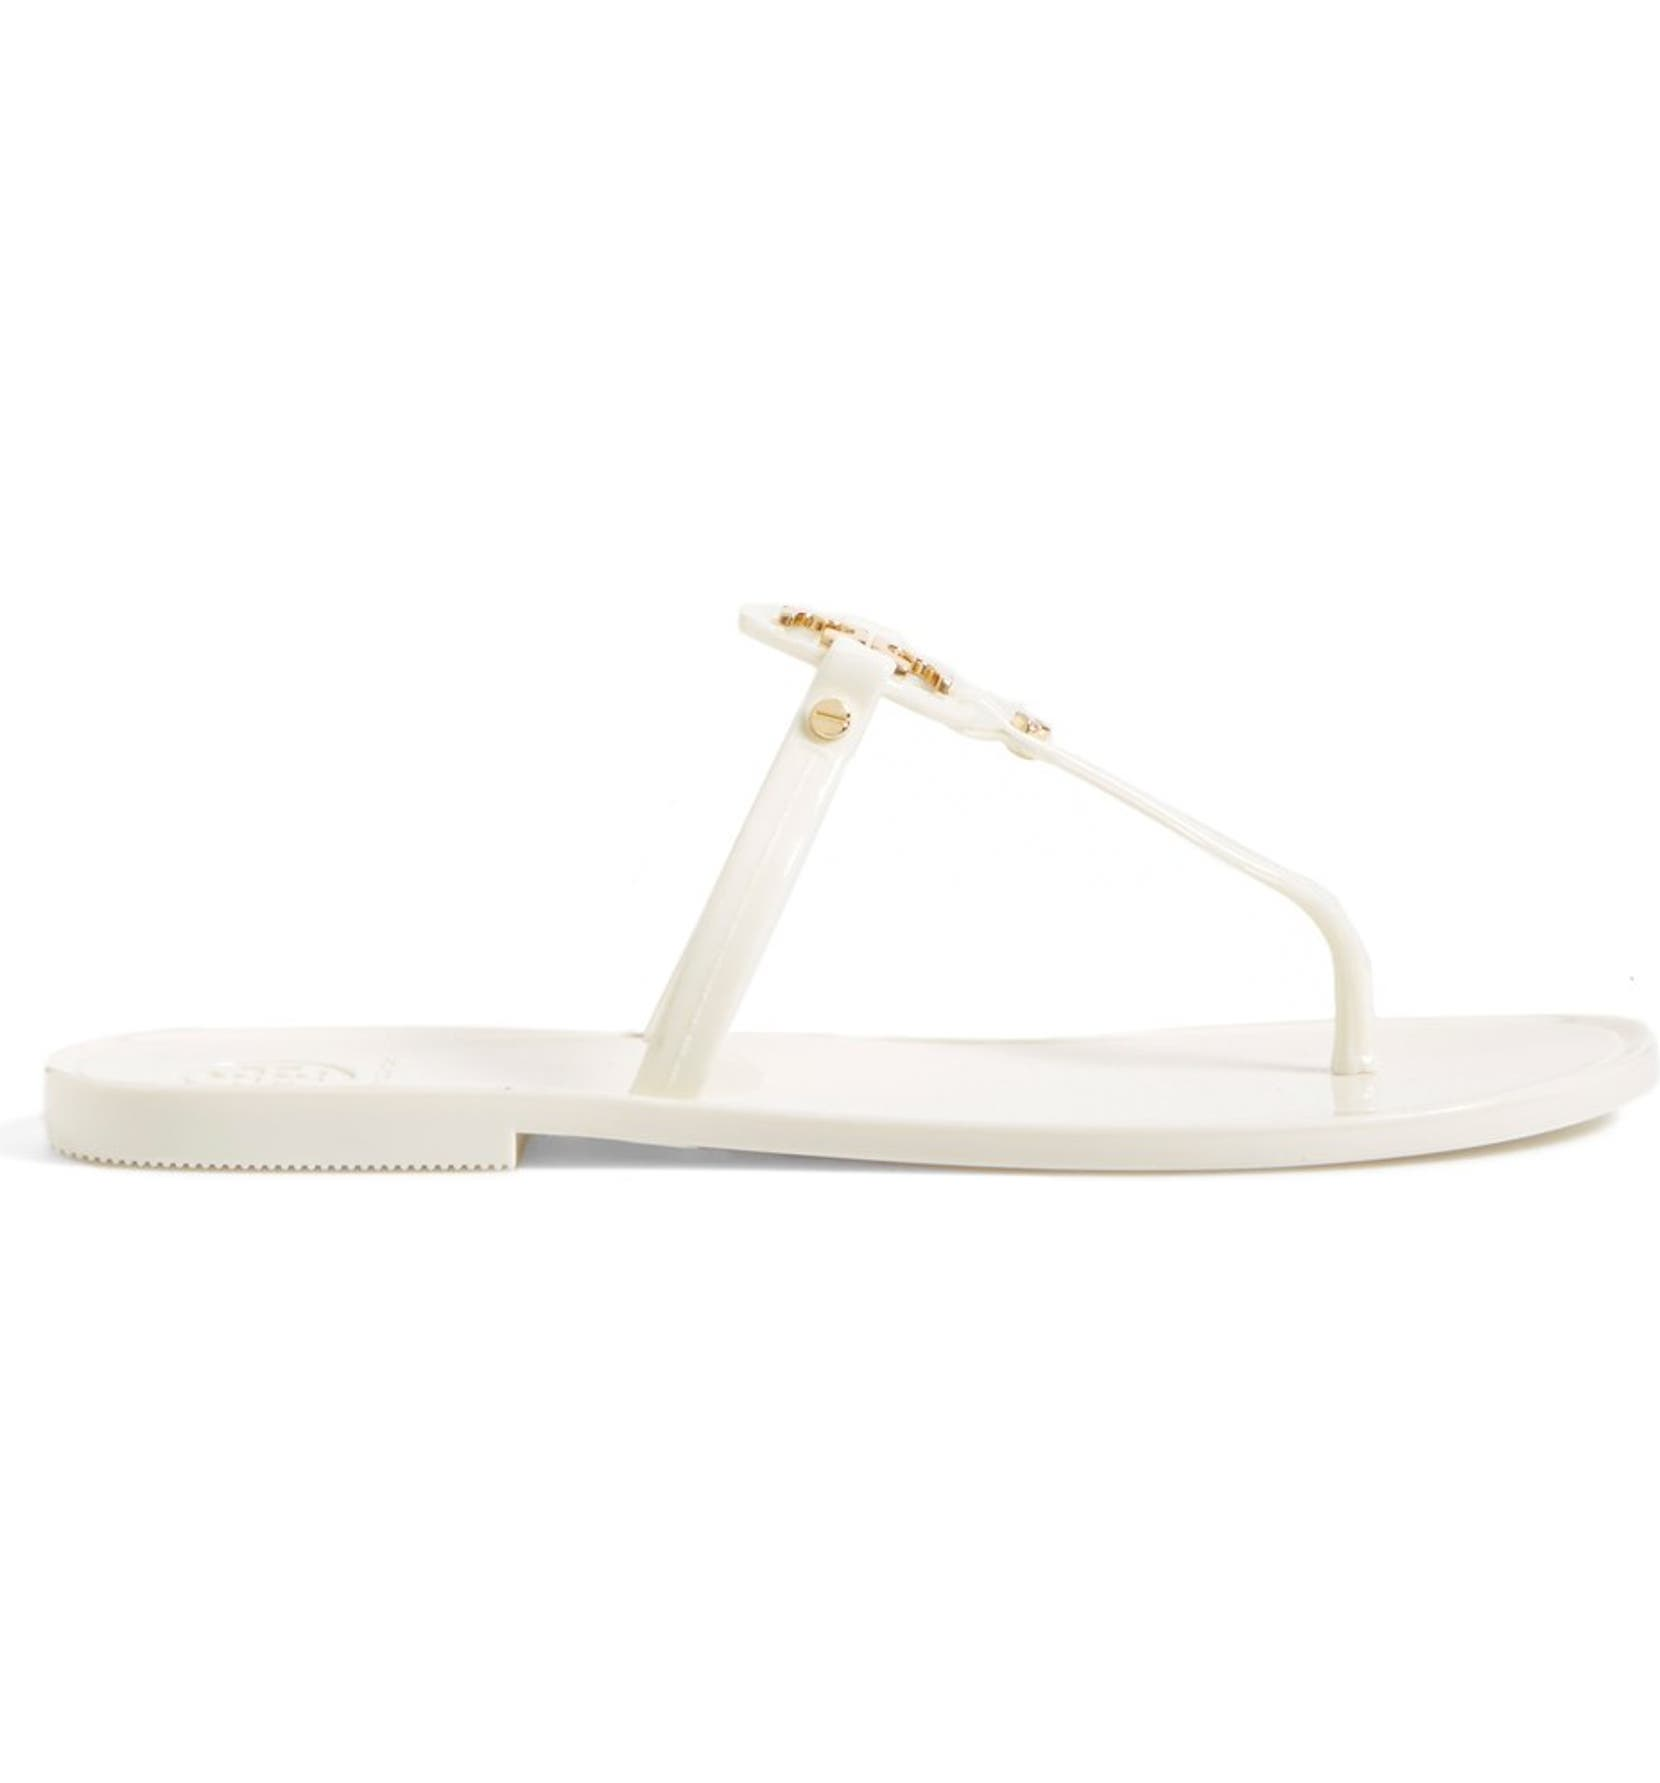 741aa6ad6c7 Tory Burch  Mini Miller  Flat Sandal (Women)